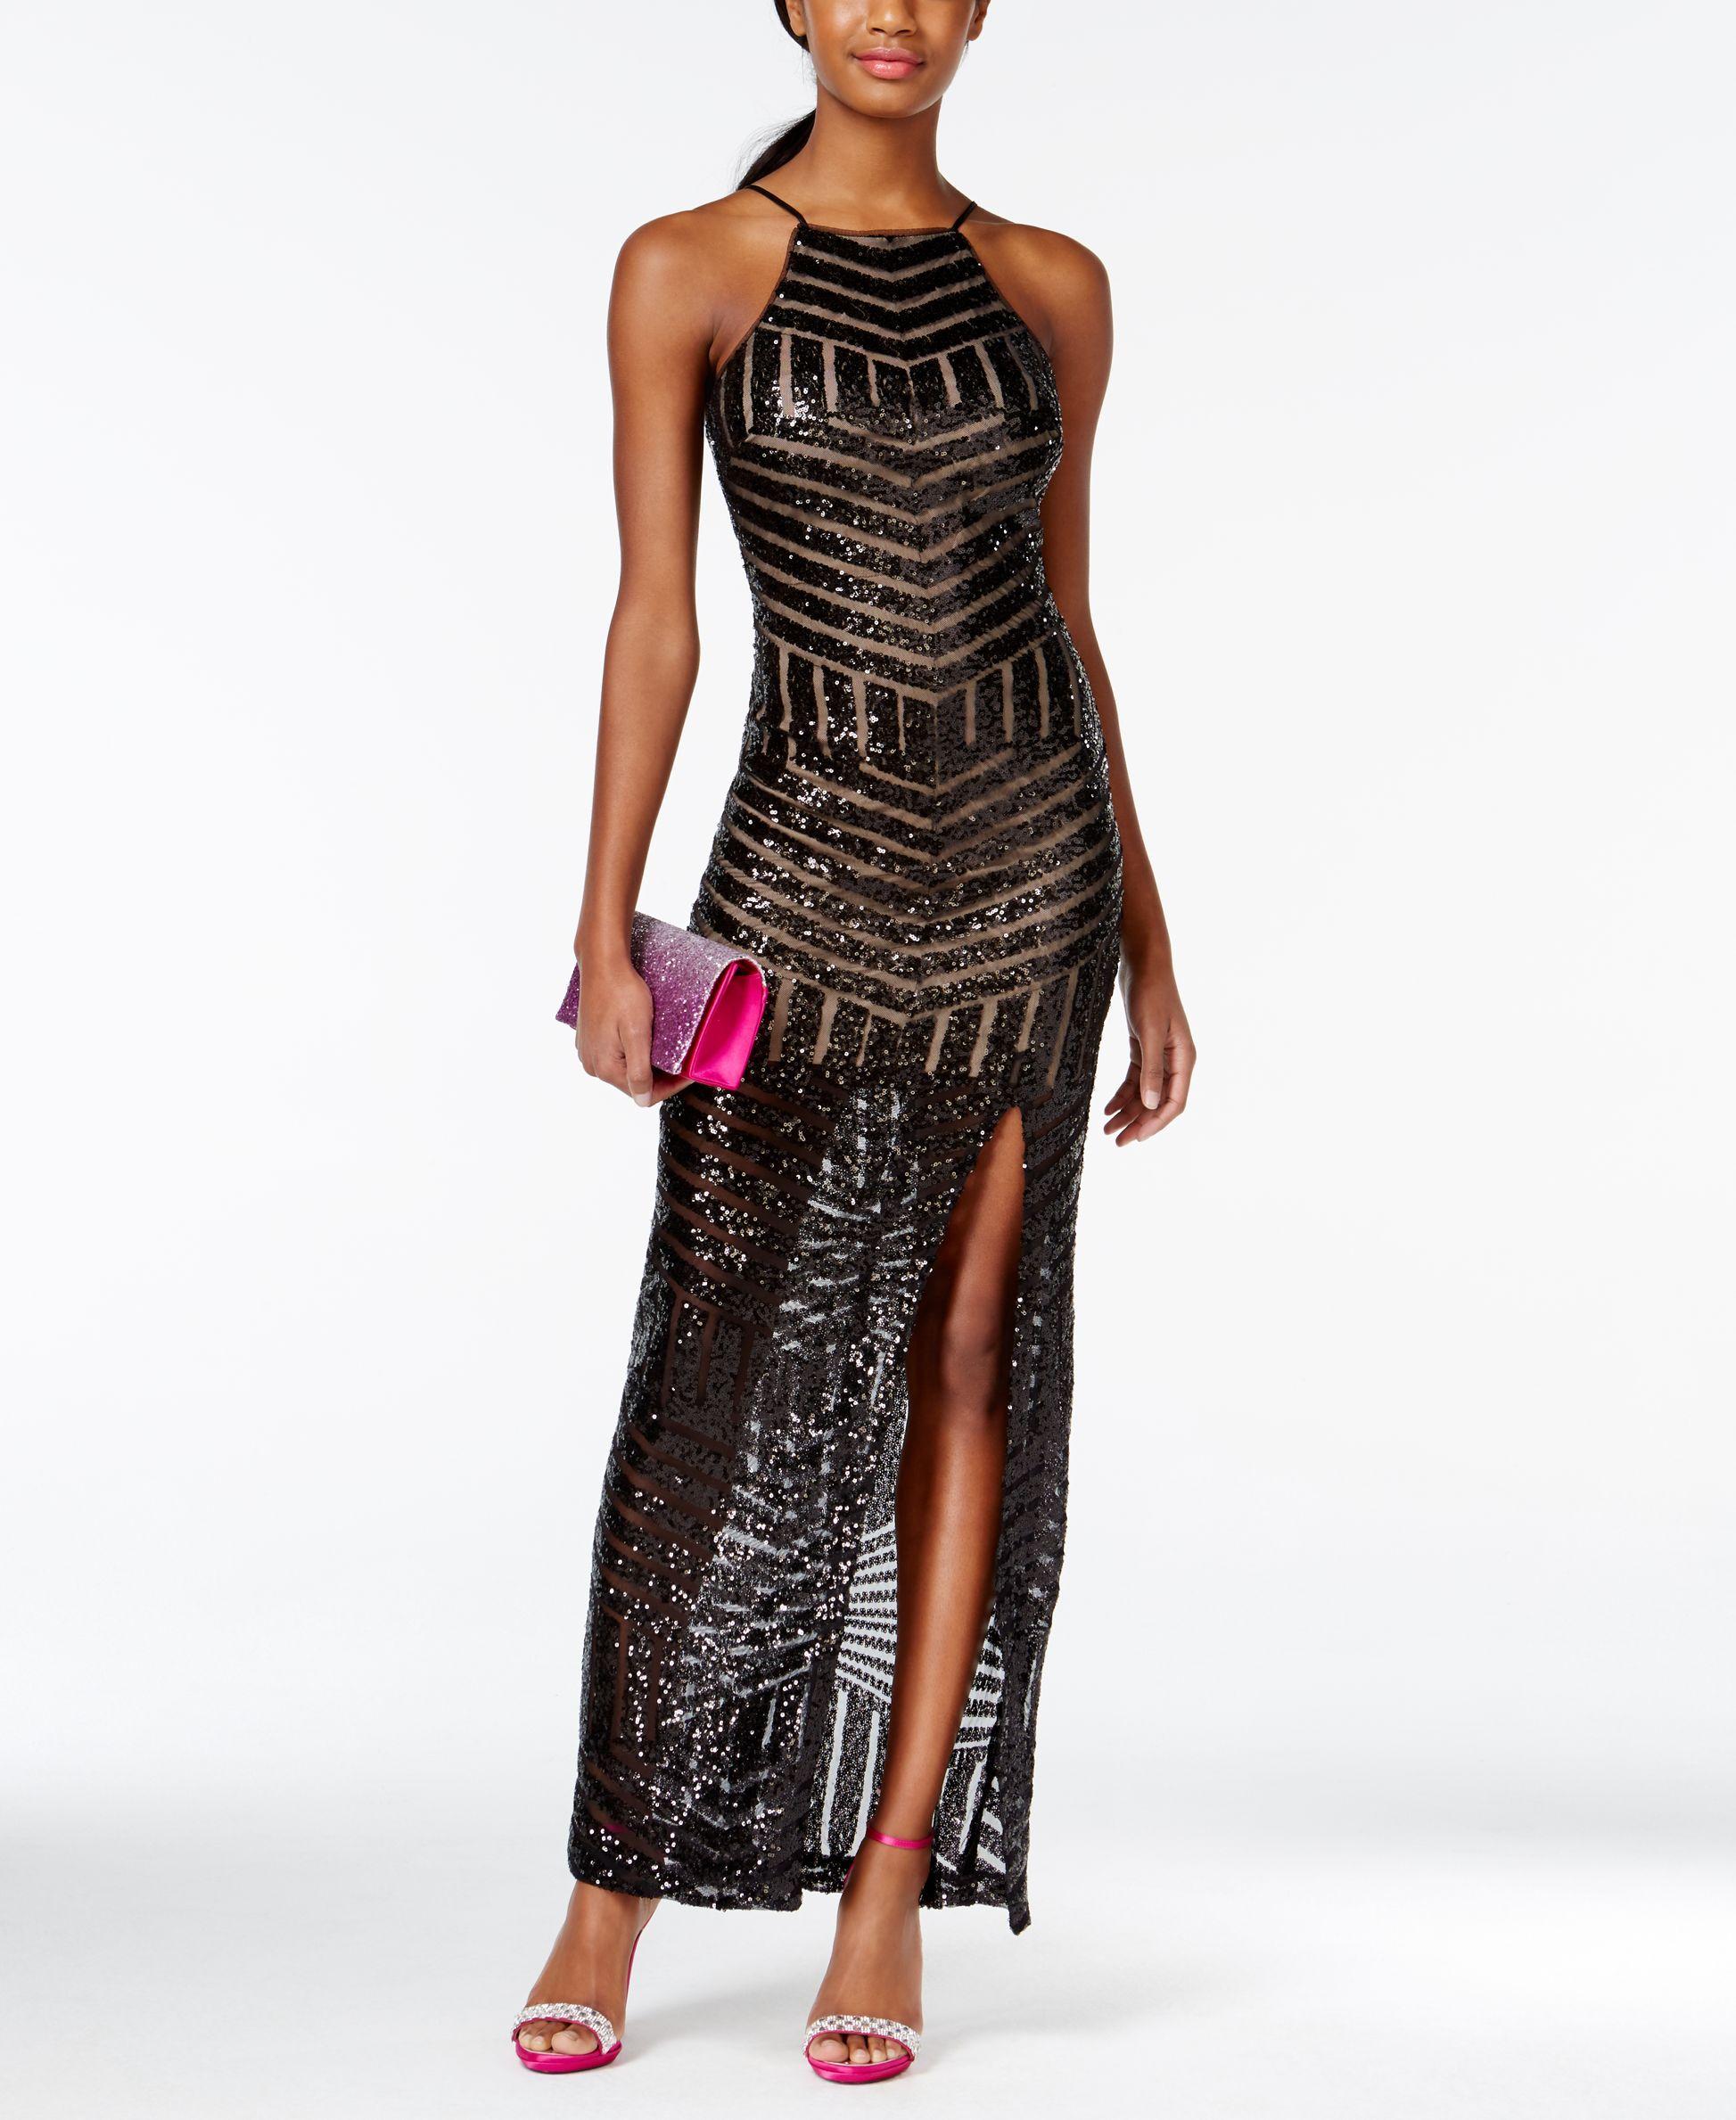 Teeze me juniorsu sequin bodycon gown with side slit dresses